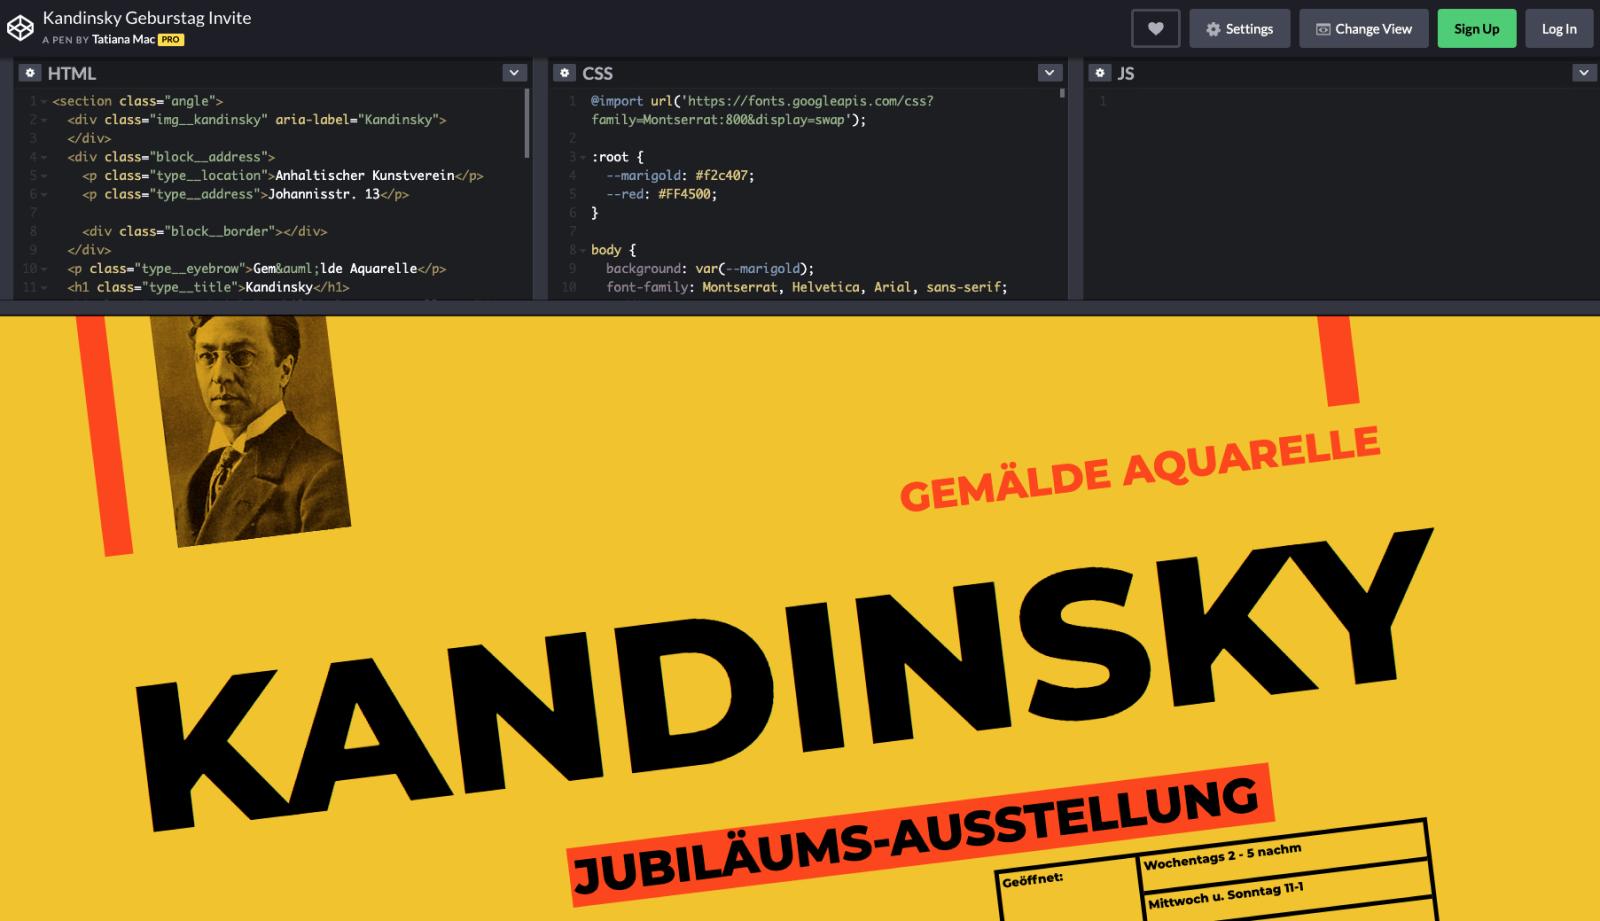 Kandinsky Geburstag Invite - CSS